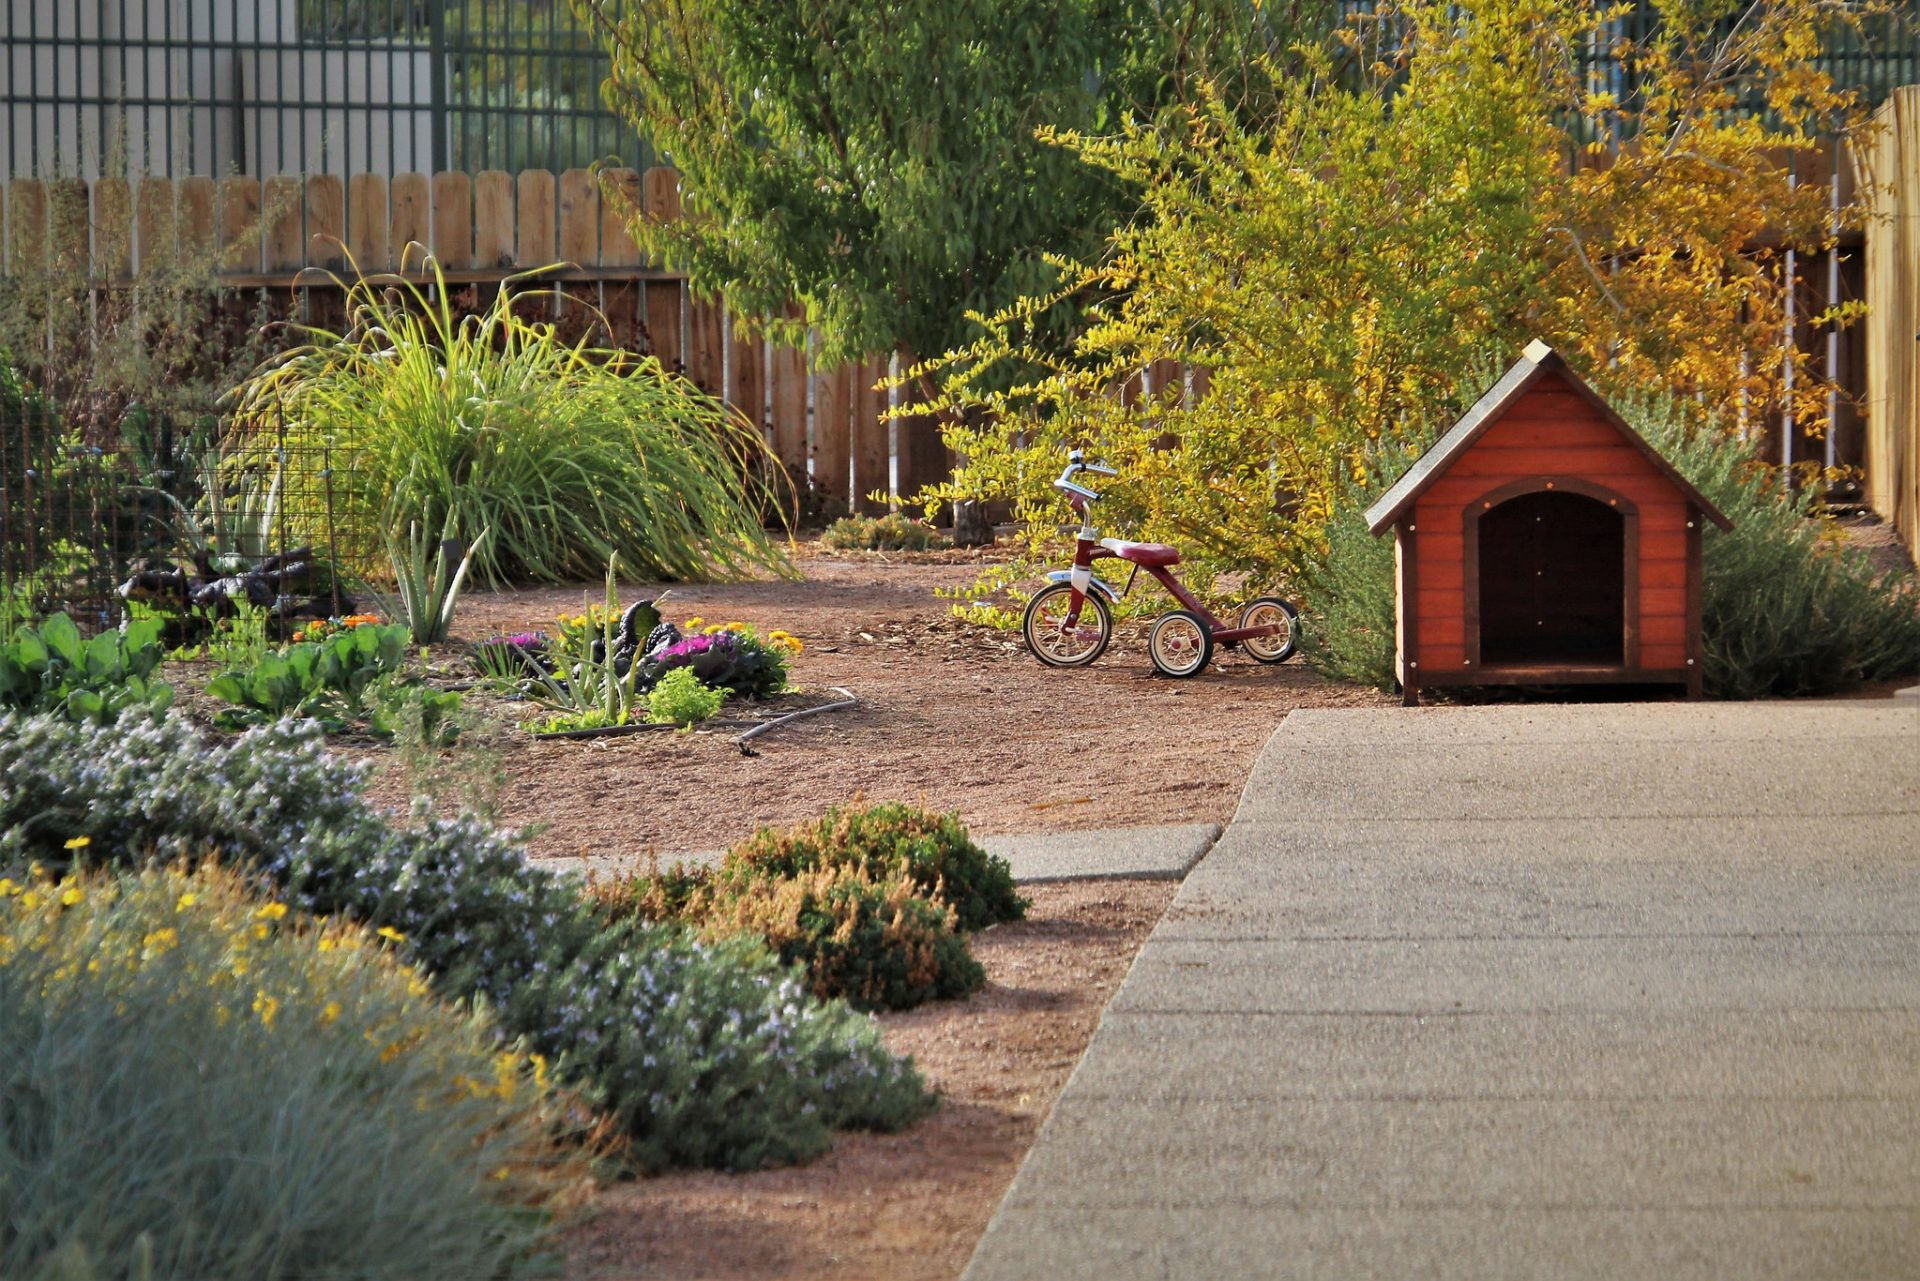 zahrada-umiestnenie-budy-trojkolka-kvety-stromy-kriky-chodnik